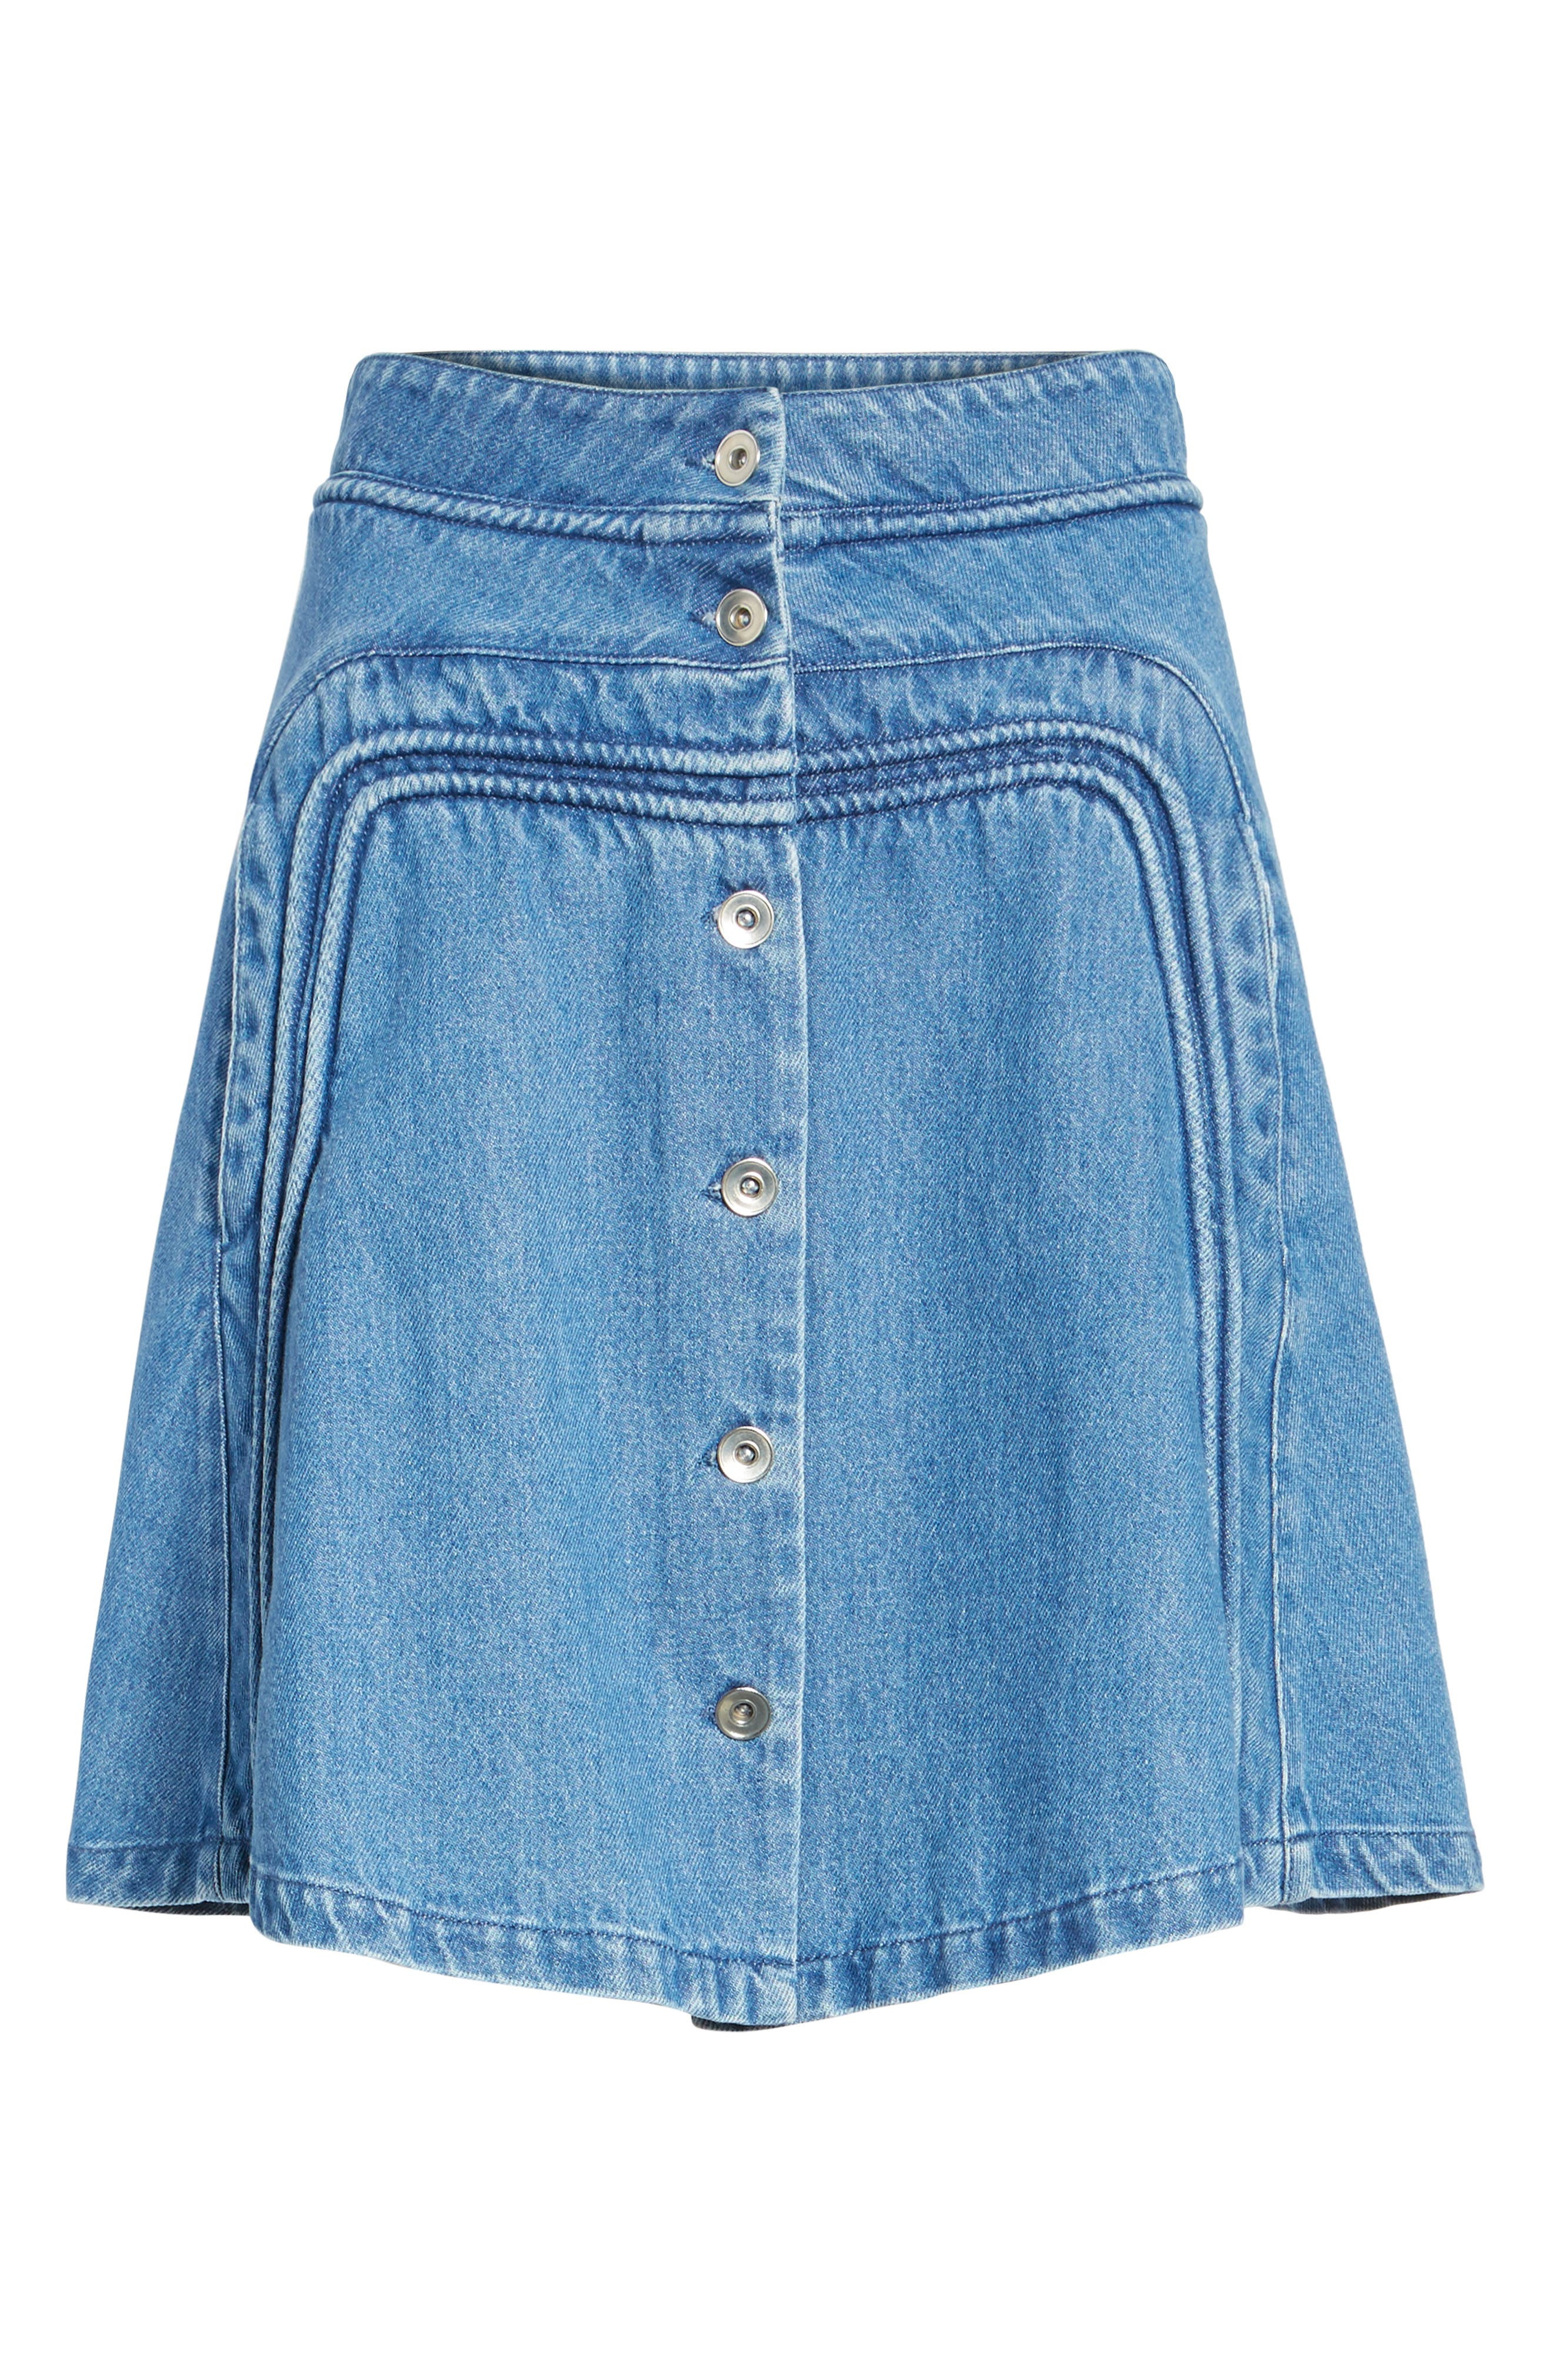 A-Line Skirt,                             Alternate thumbnail 6, color,